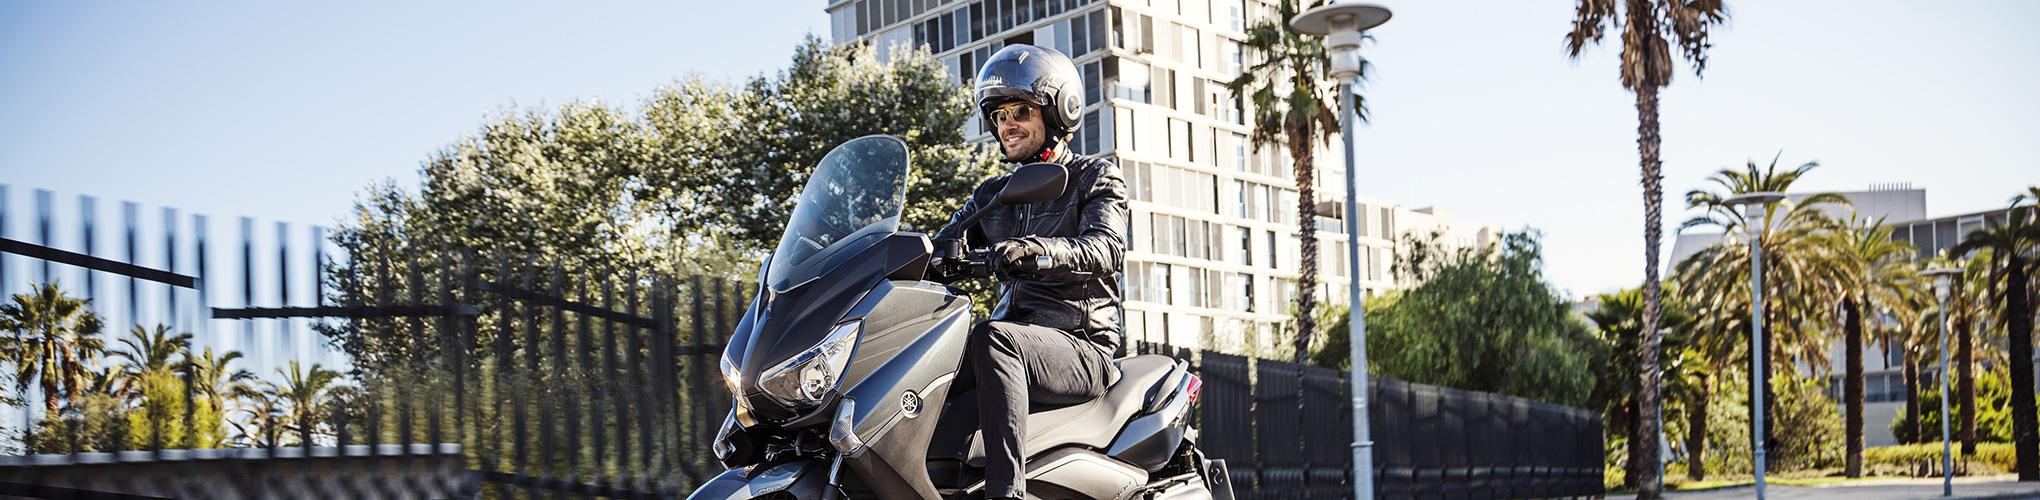 Yamaha X-MAX 400 ABS | MotorCentrumWest